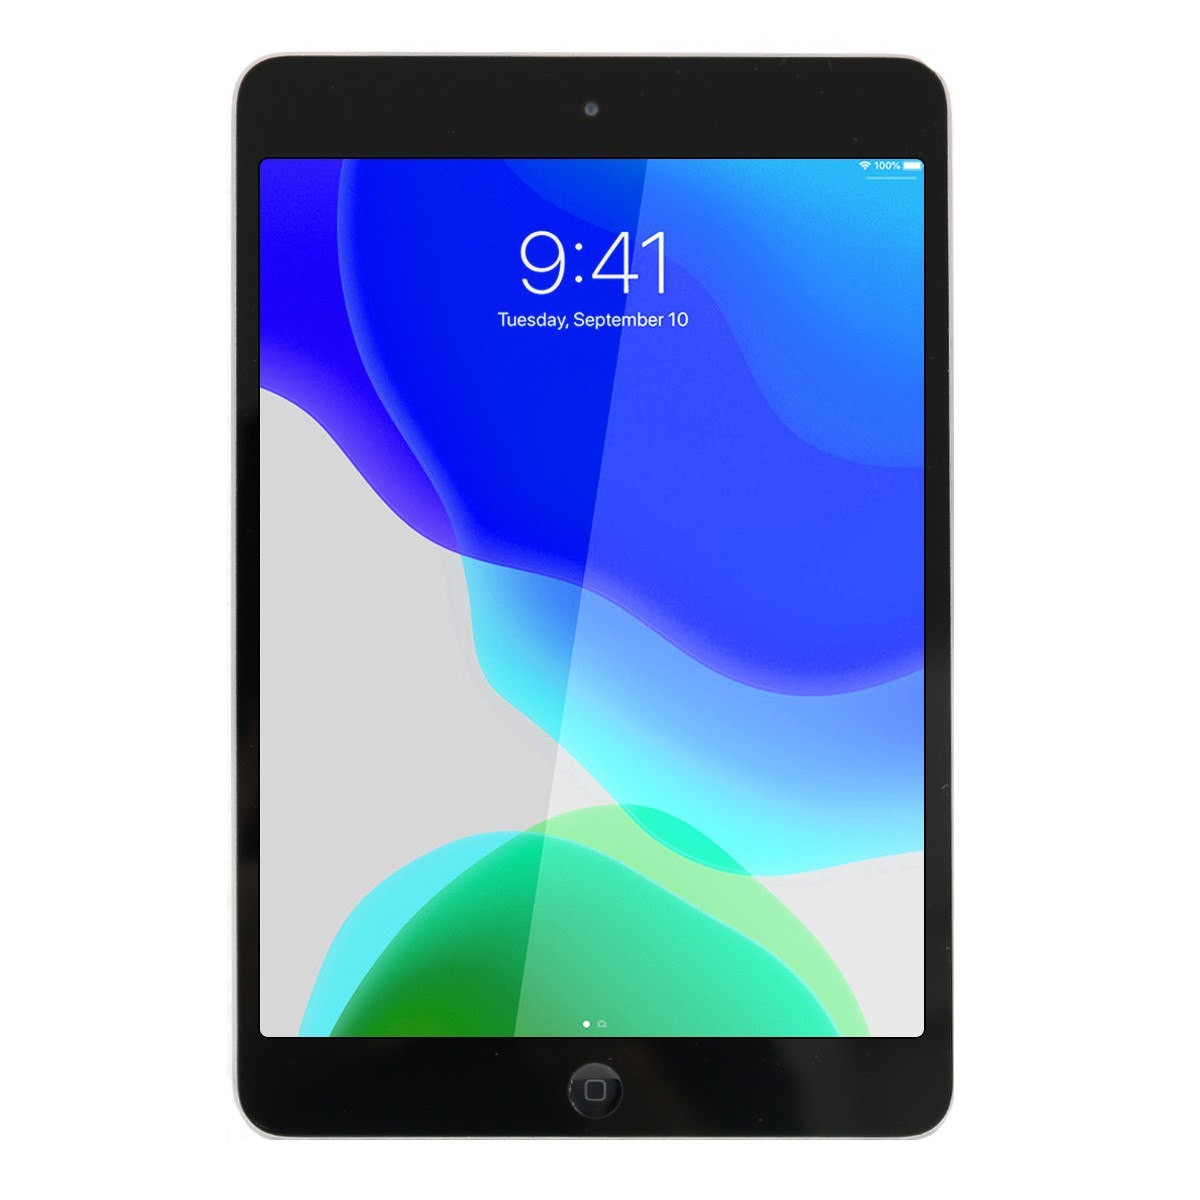 Ipad apple mini 2 a1489 wifi 32gb preto - usado